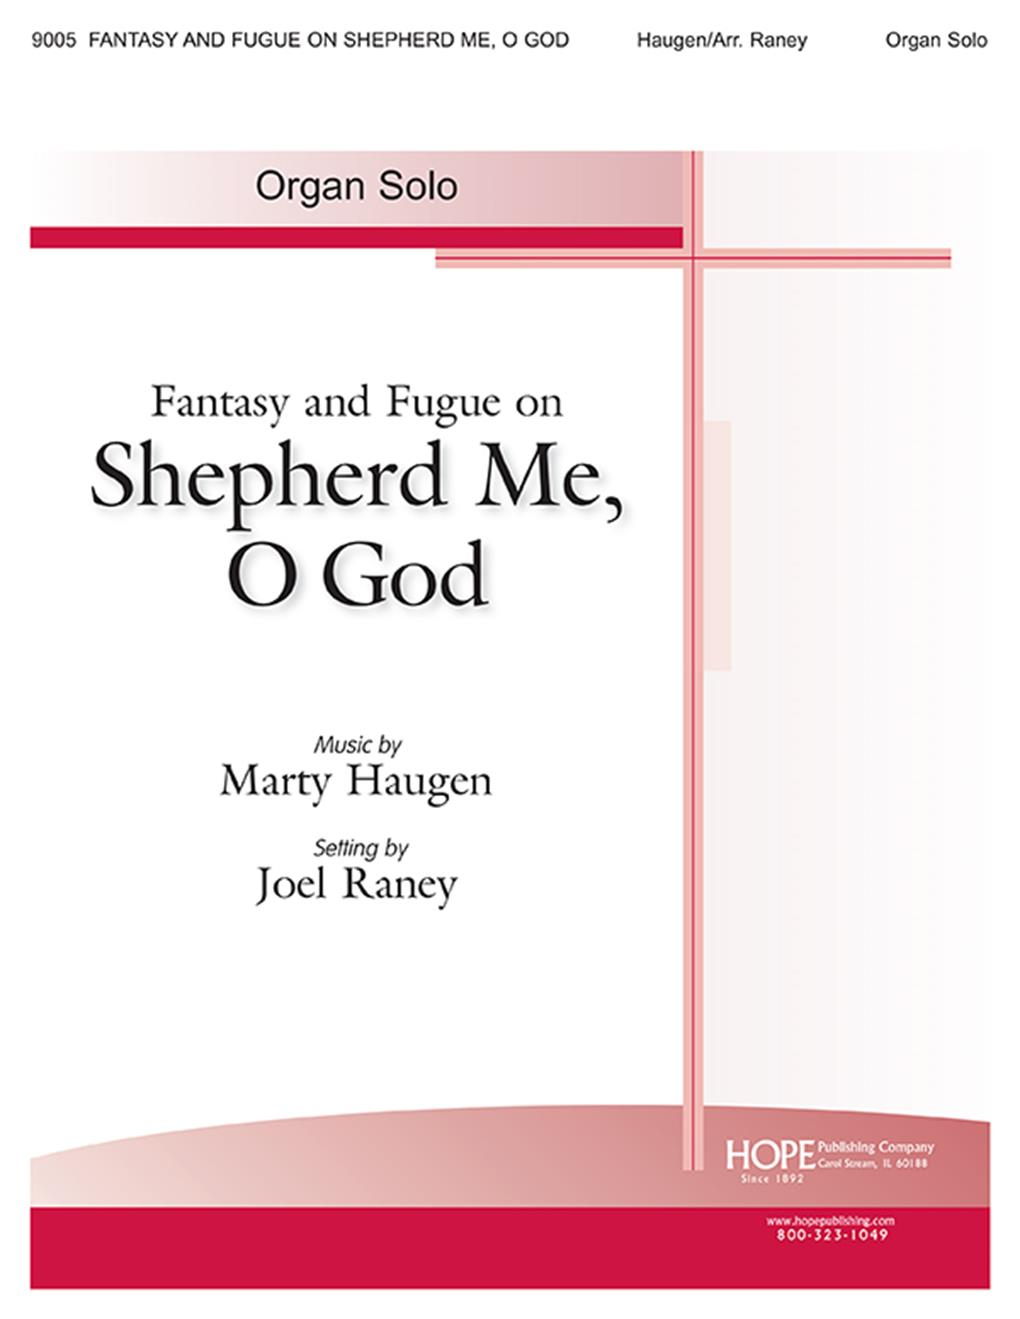 Fantasy and Fugue on Shepherd Me O God - Score Cover Image